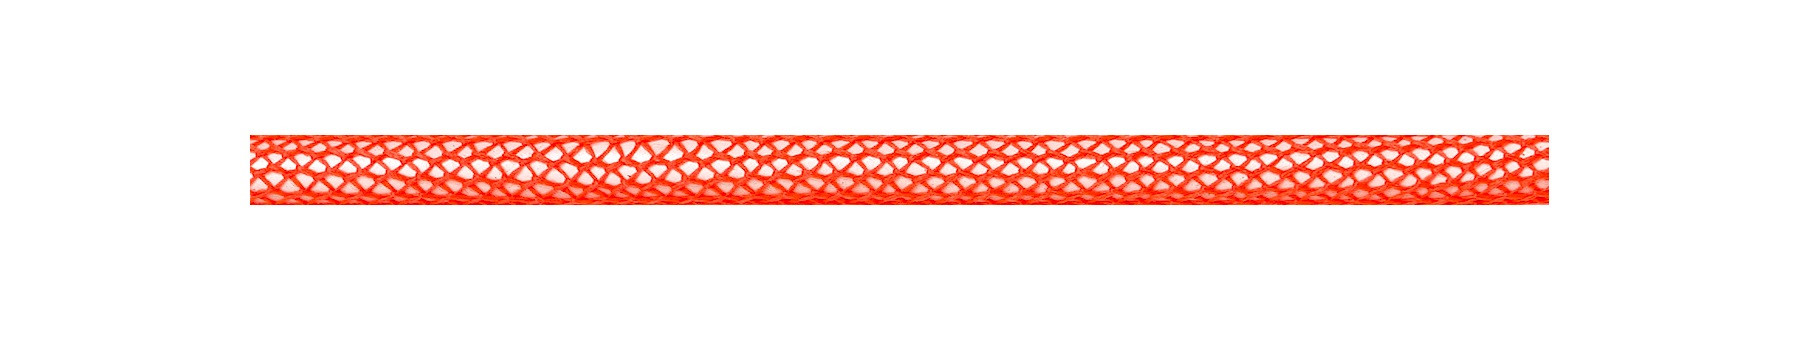 Textilkabel Neon Orange Netzartiger Textilmantel